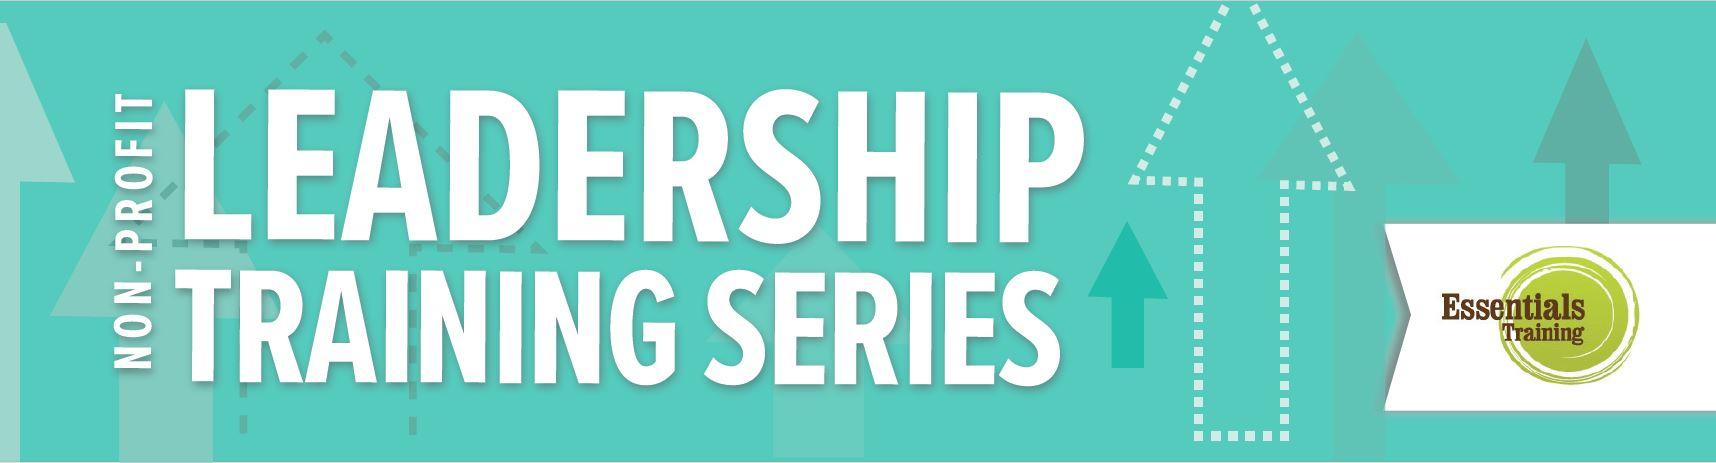 Non-Profit Leadership Training Series